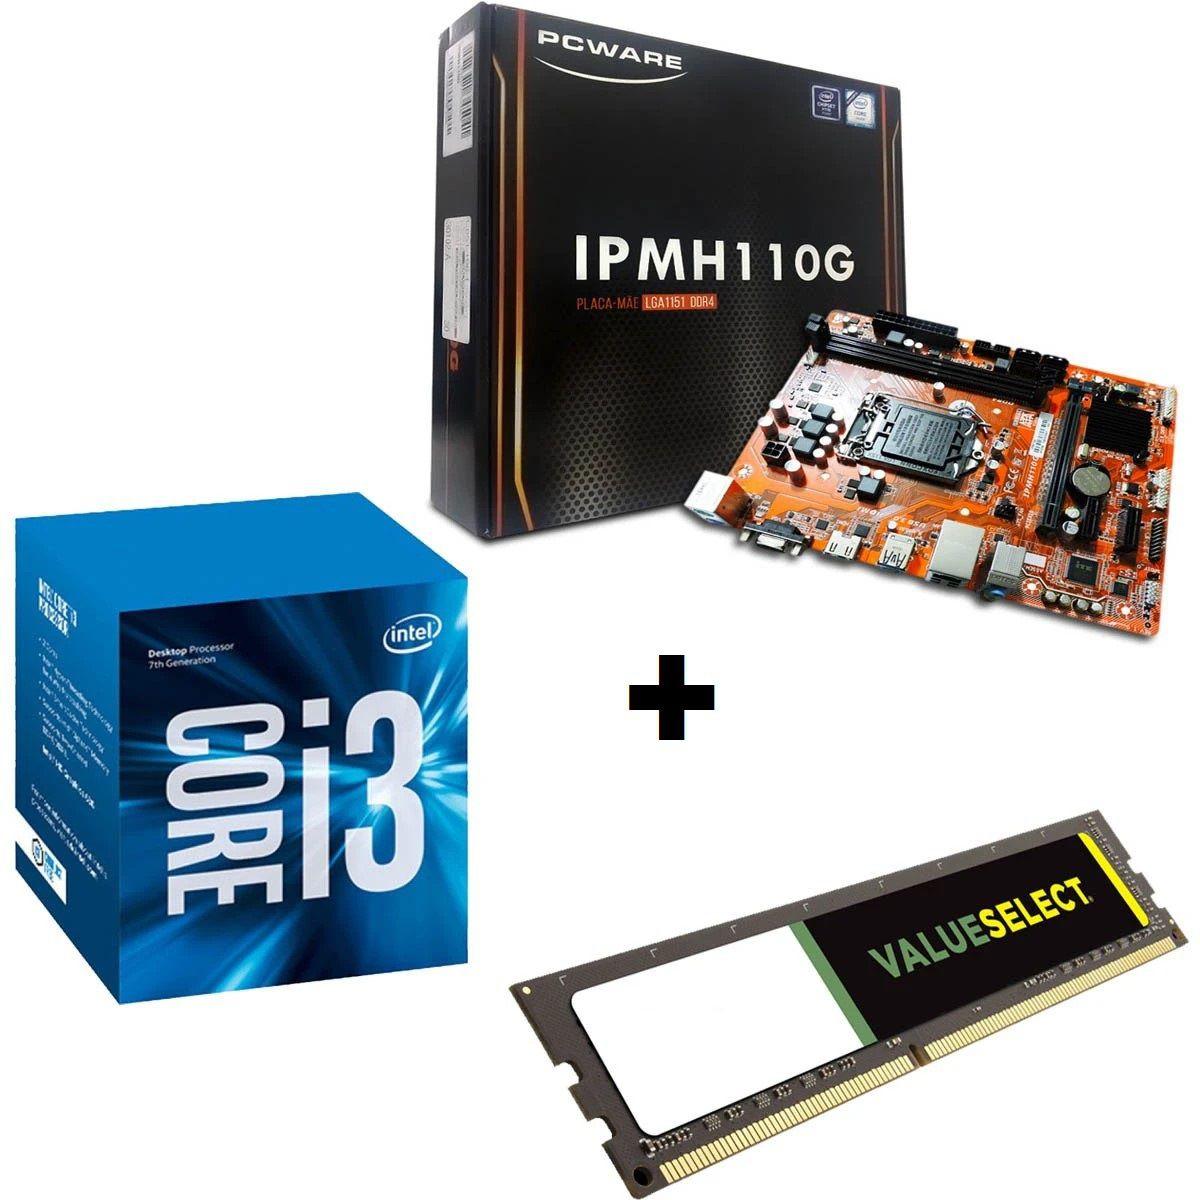 KIT - PLACA MÃE 1151/DDR4 PCWARE + INTEL CORE I3 3.9GHZ + MEMORIA 4GB/DDR4 AFOX